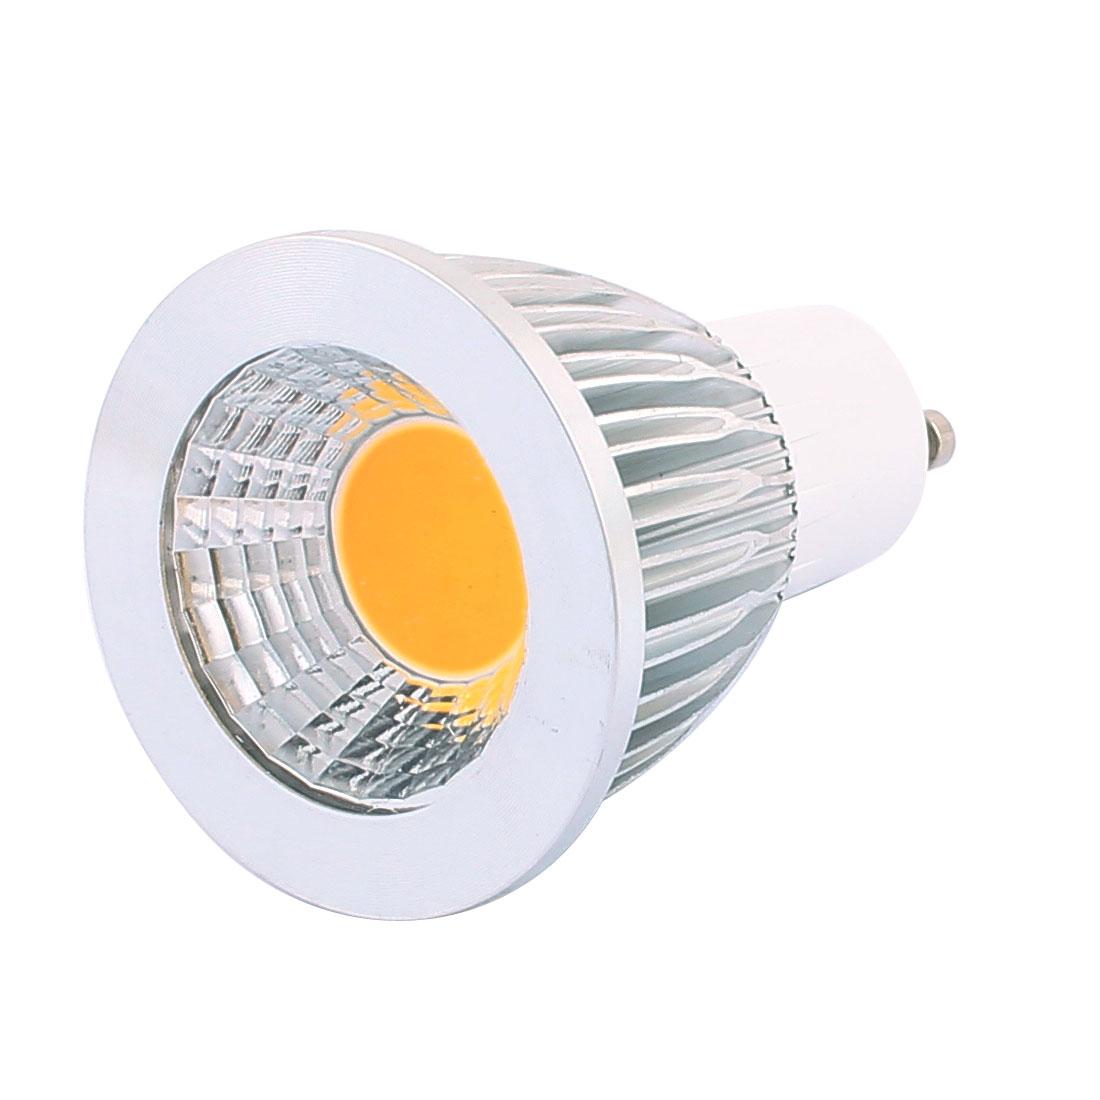 AC85-265V 5W Bright GU10 COB LED Spot Down Light Lamp Energy Saving Warm White